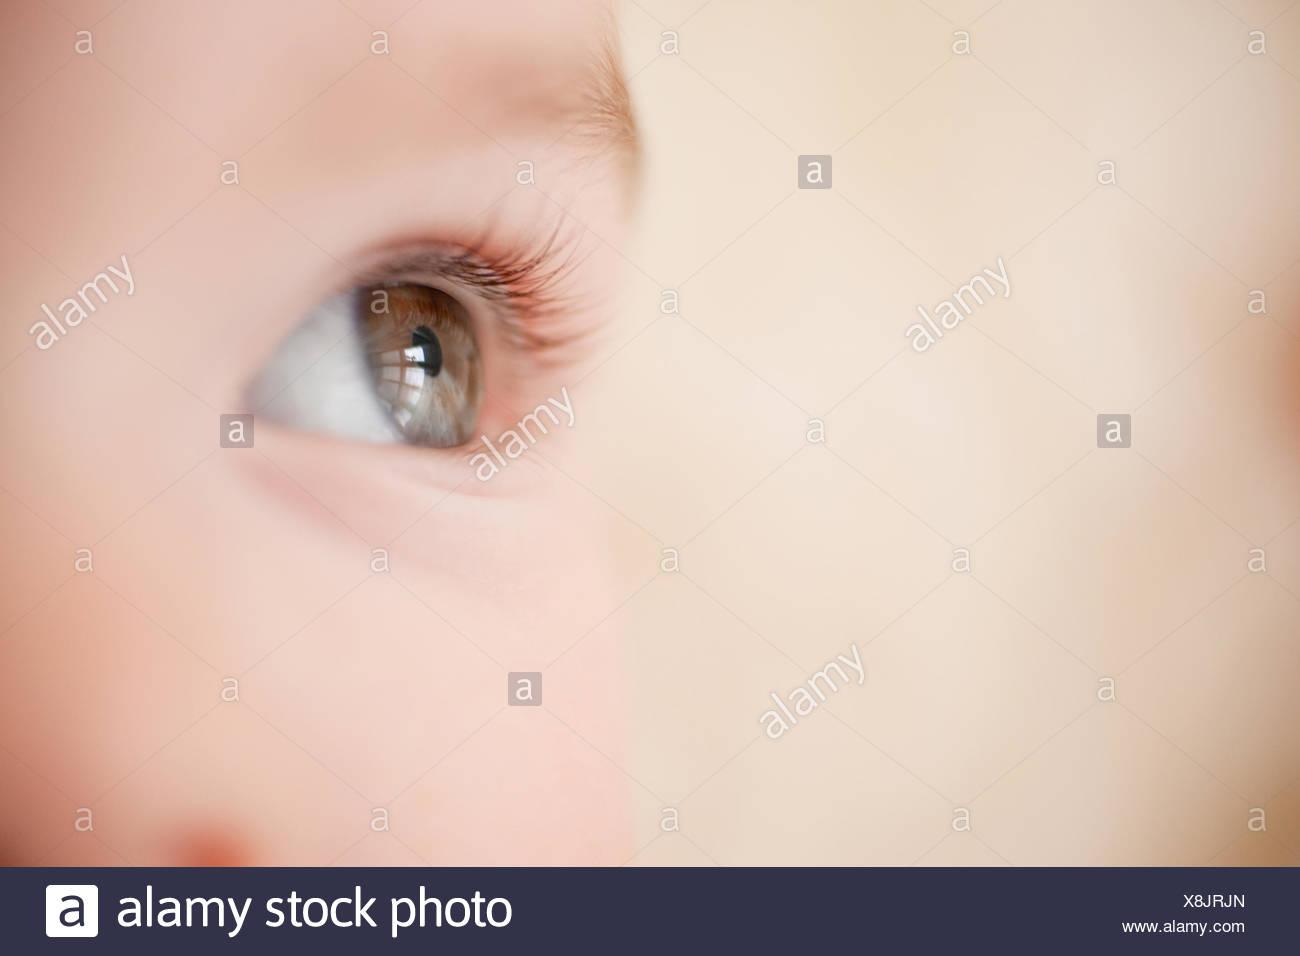 Close up of babyÂ's eye - Stock Image